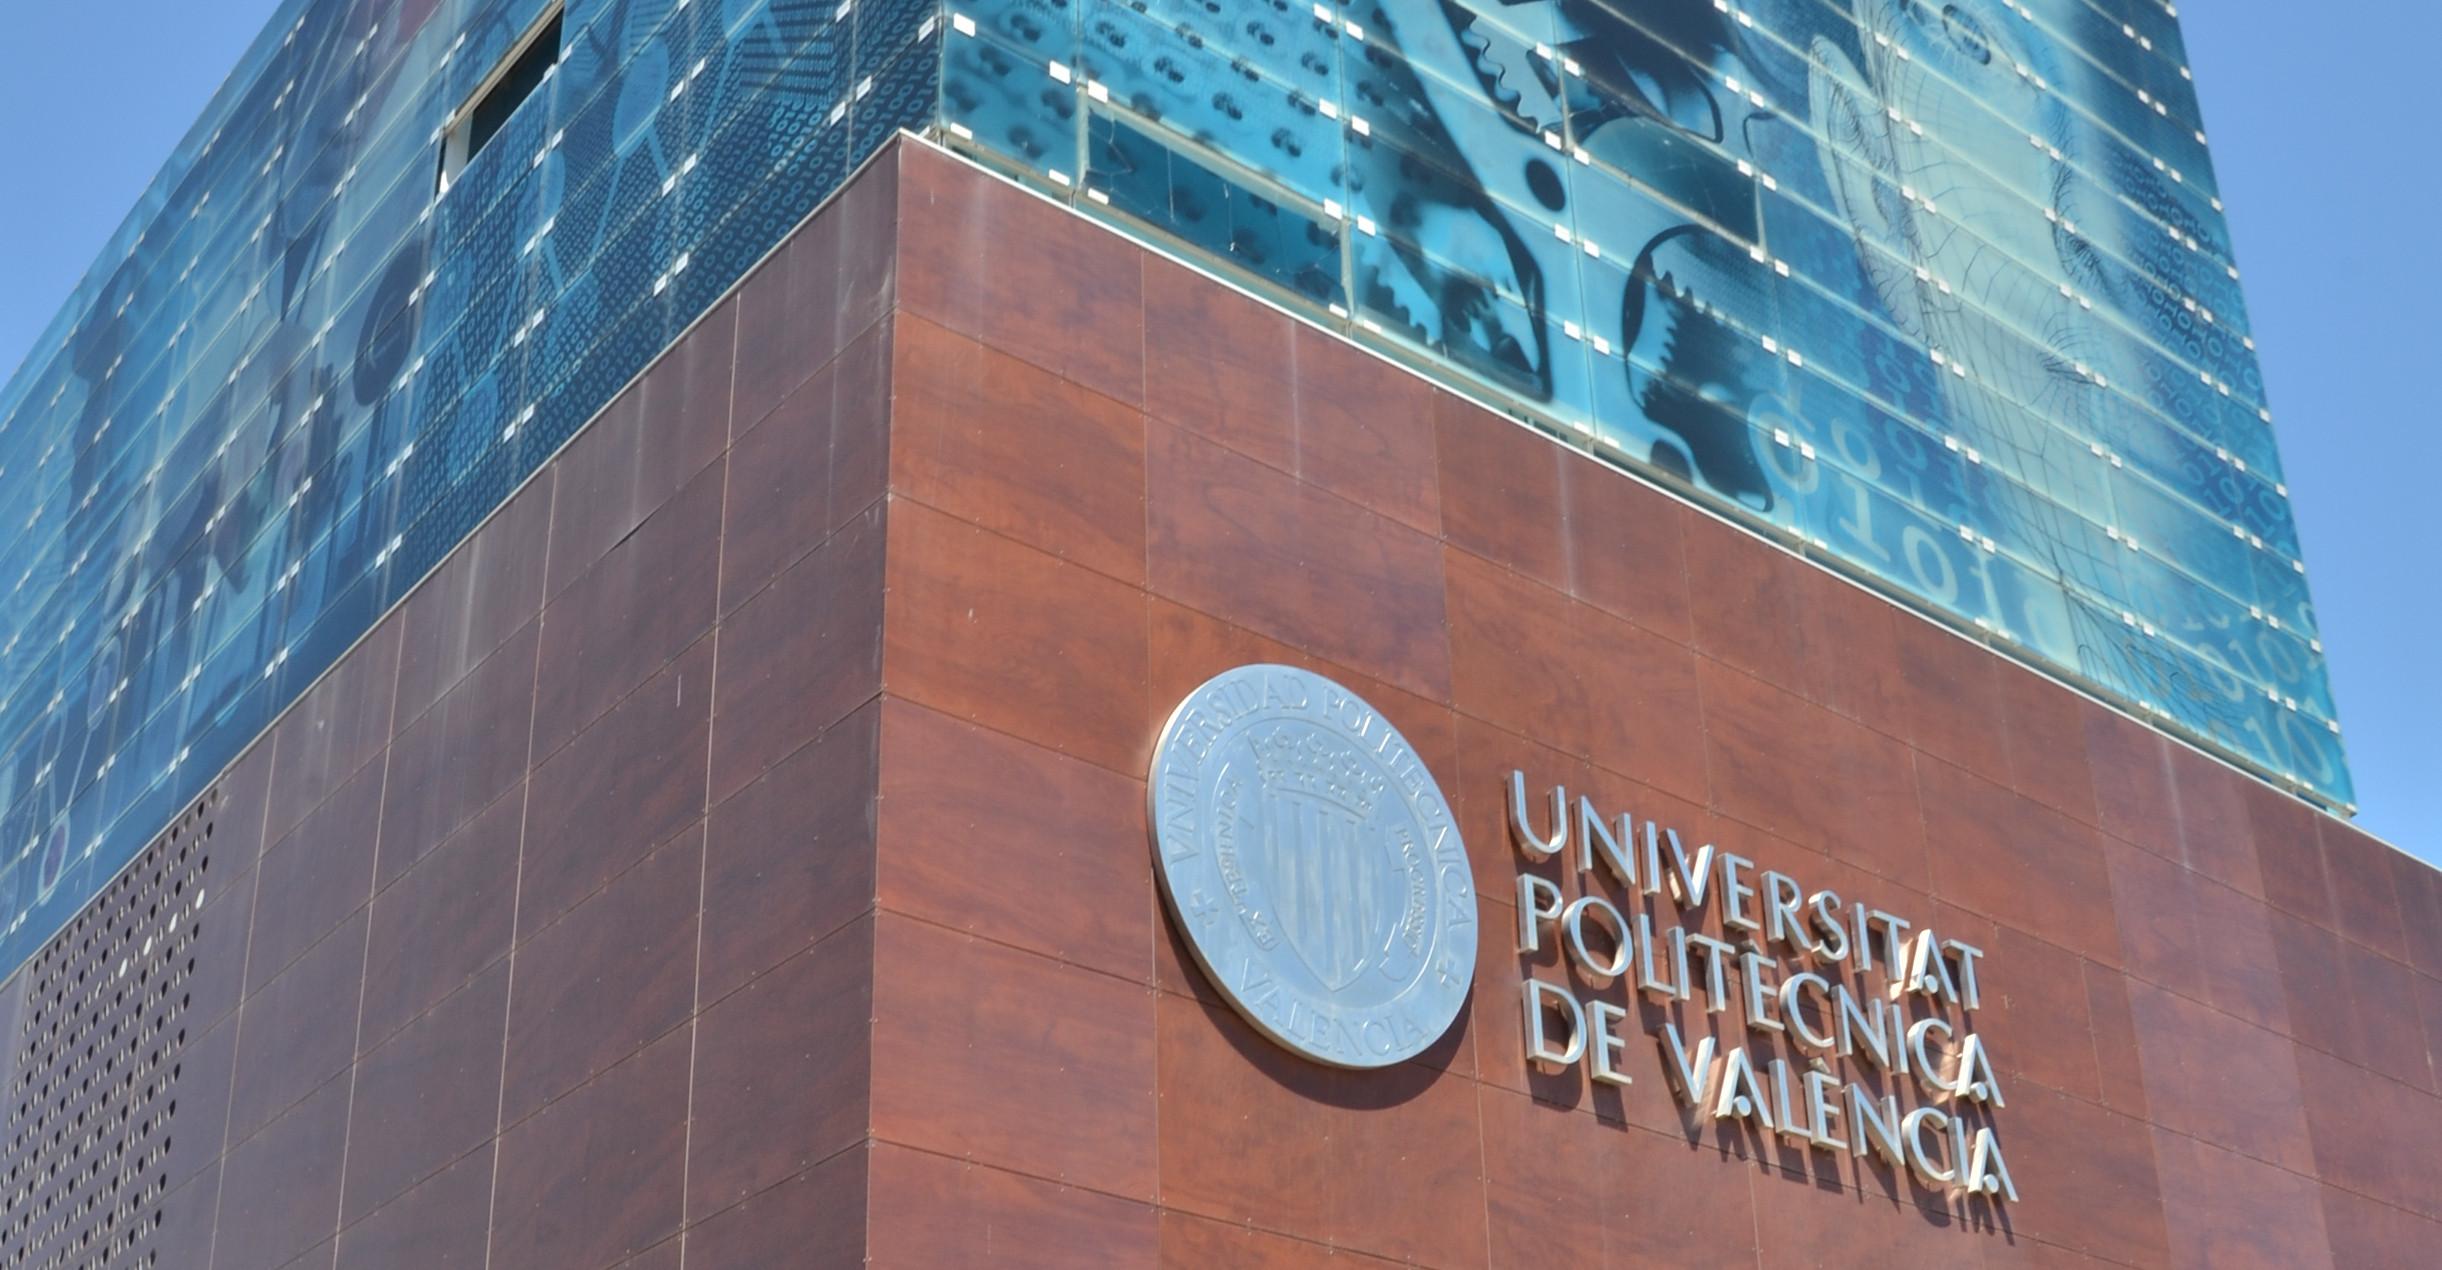 La Universitat Politècnica de València se une a RENIC